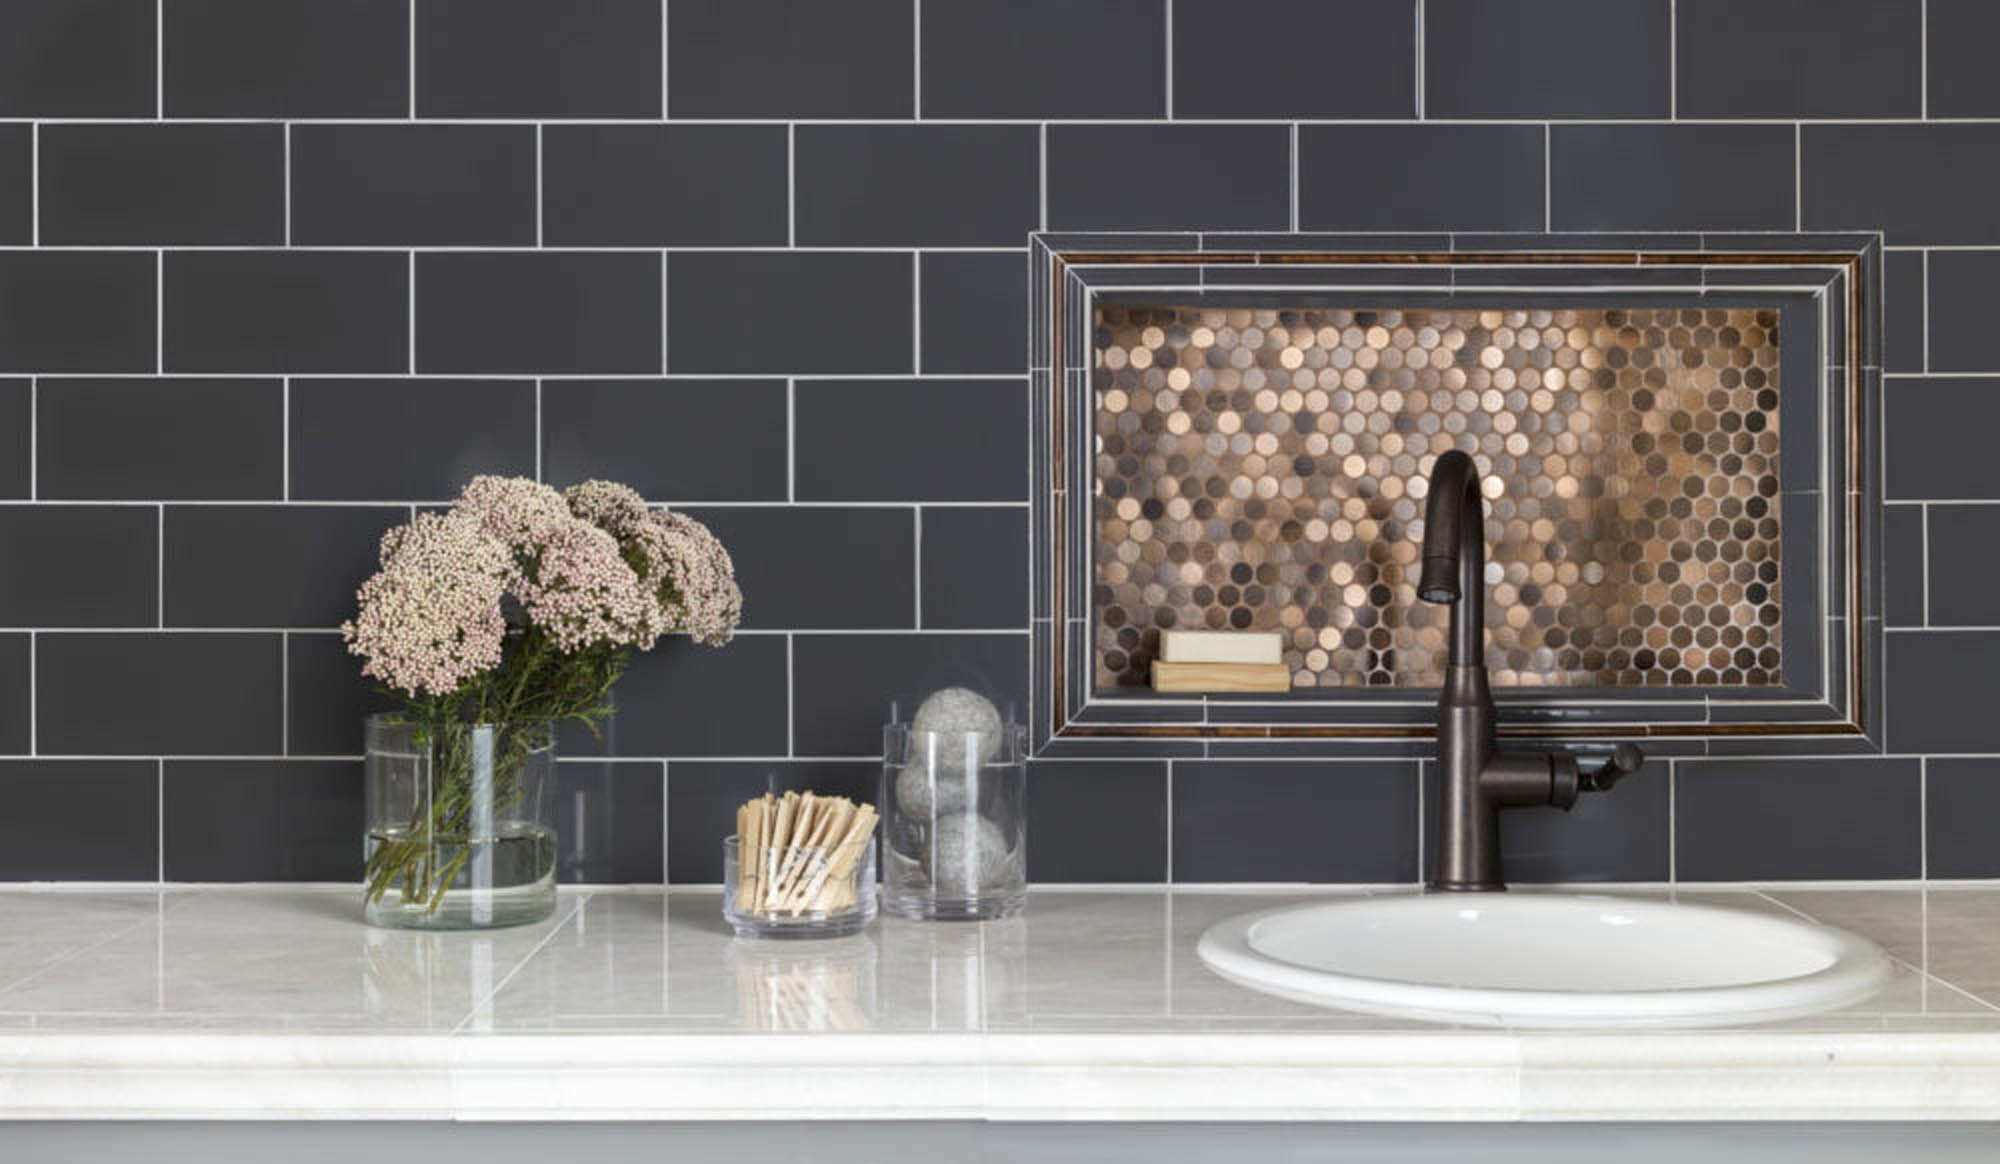 Copper penny round mosaic backsplash